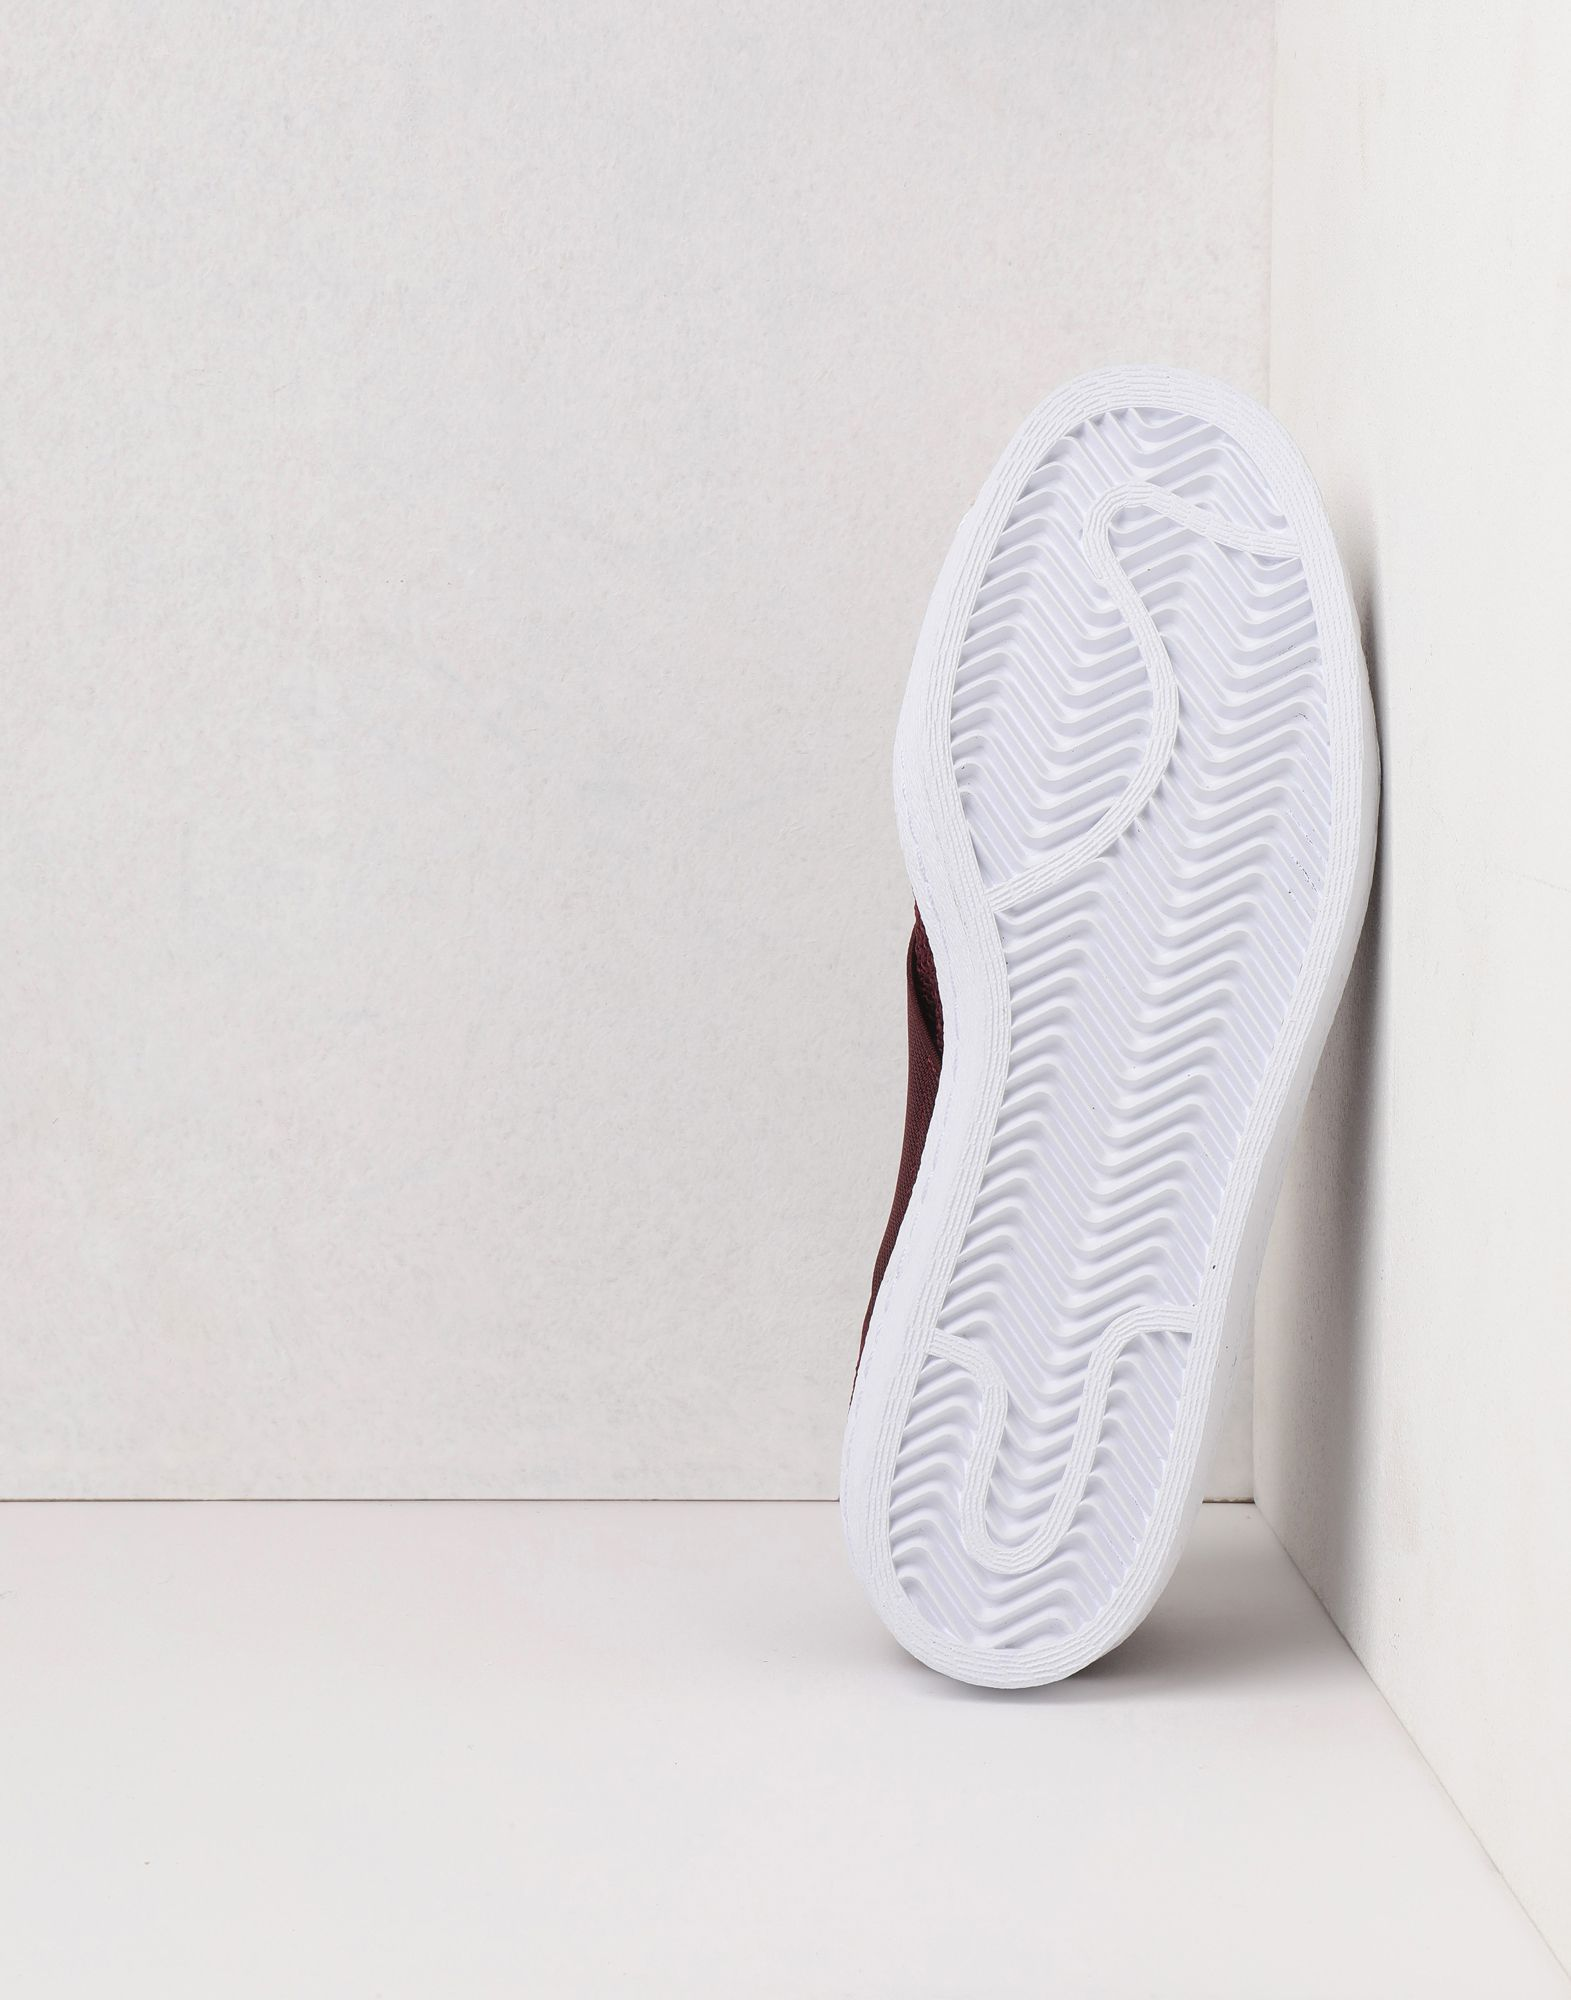 Adidas Originals Superstar Slip On W - - - Sneakers - Women Adidas Originals Sneakers online on  United Kingdom - 11565936OF daf7f8